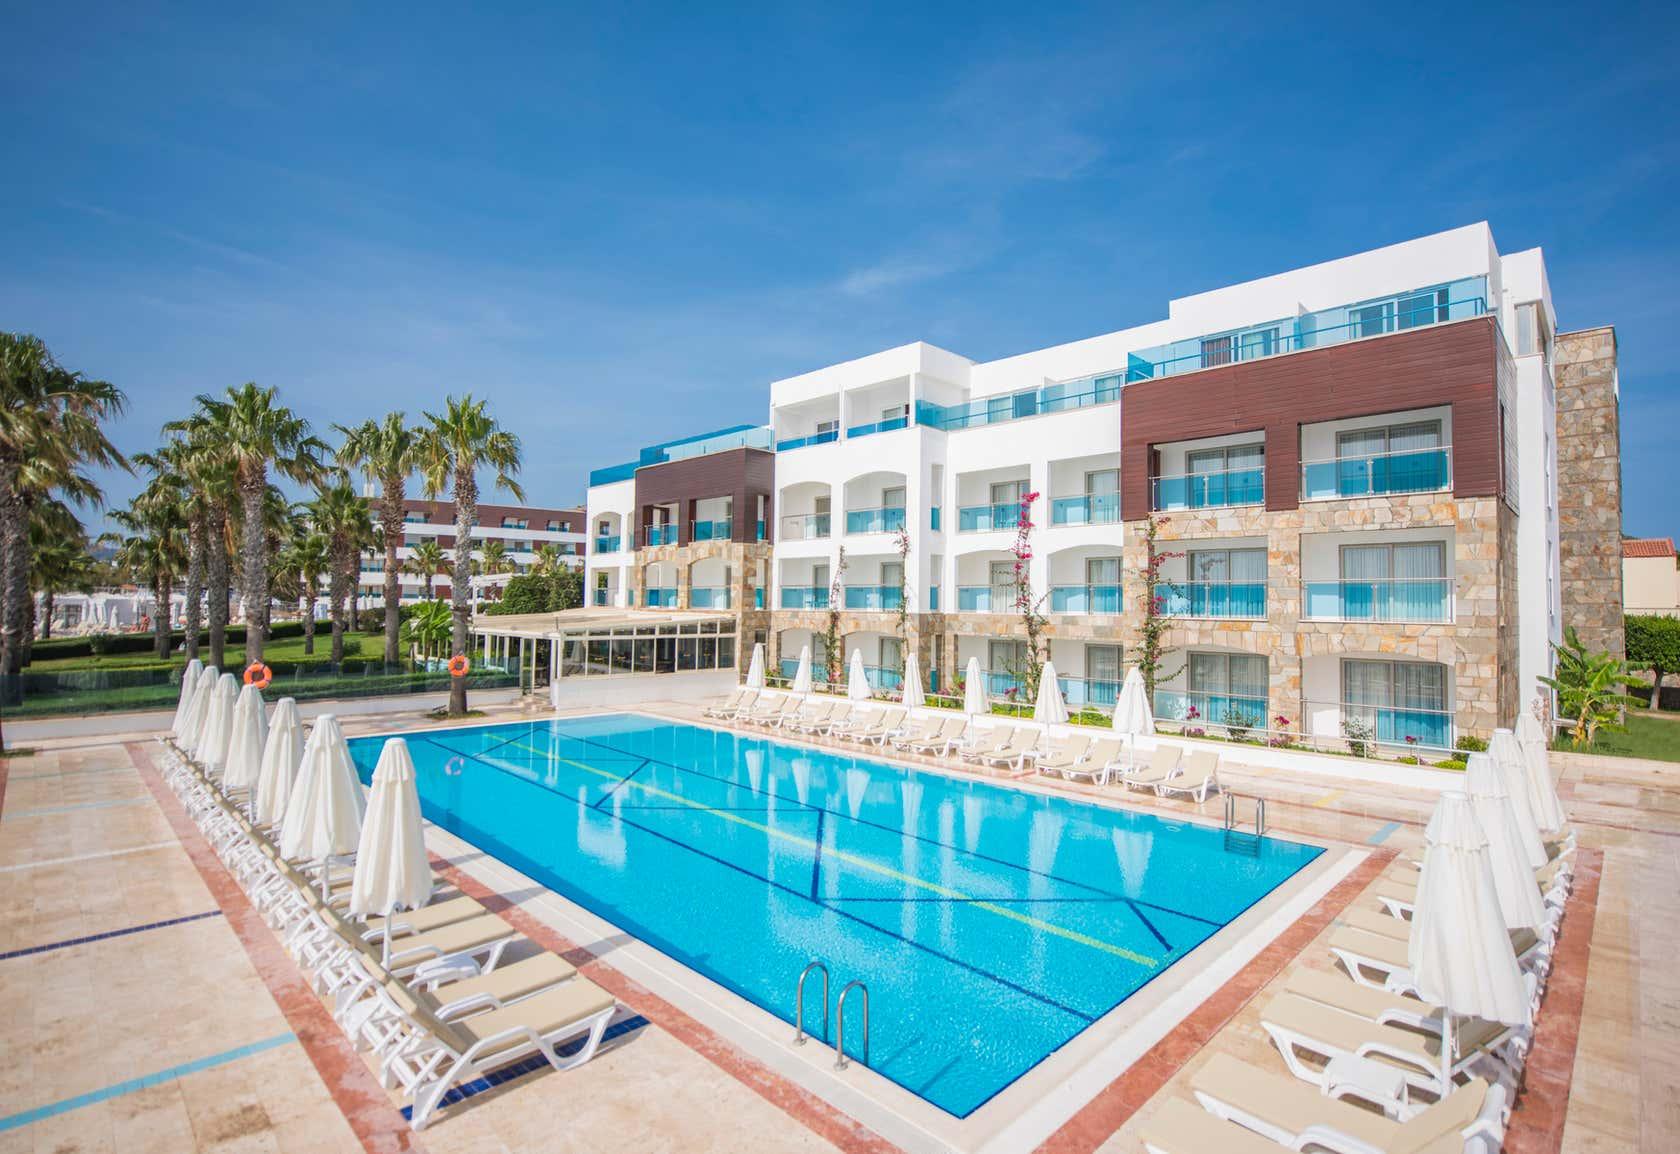 Azure by Yelken Bodrum Hotel